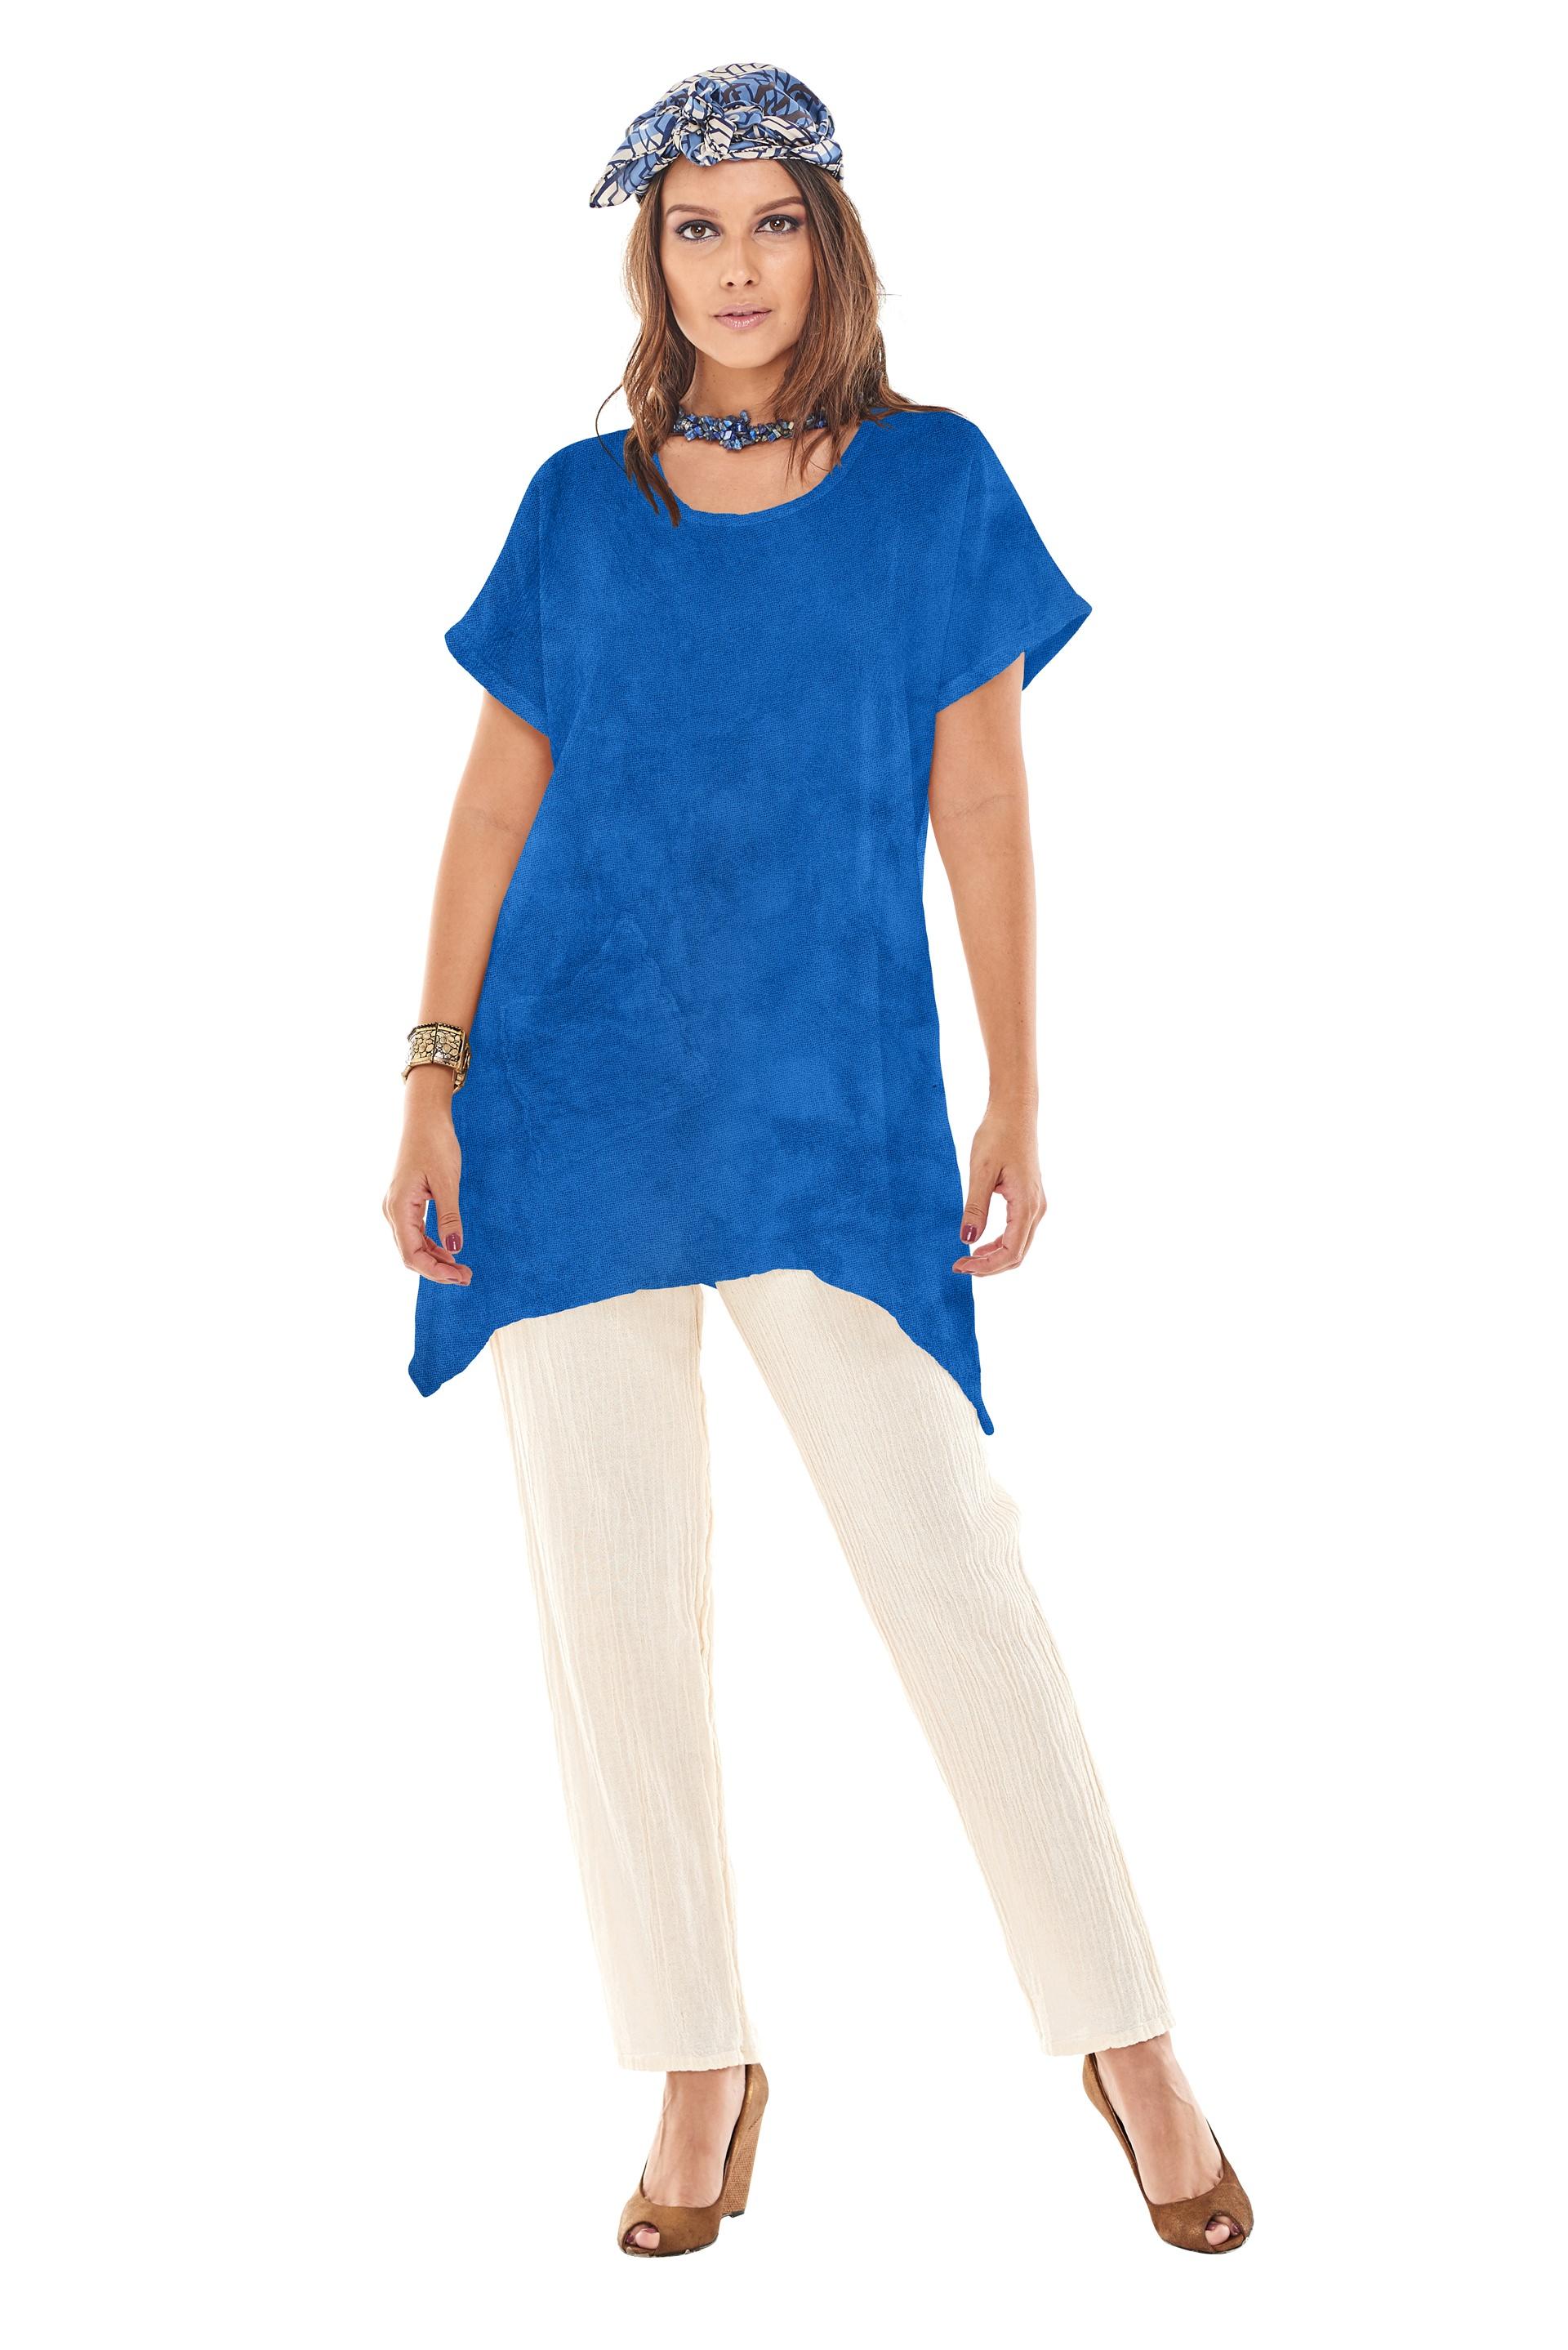 Oh-My-Gauze-Faith-Blouse-Tunic-Top-100-Cotton-Lagenlook-Short-Sleeve thumbnail 29